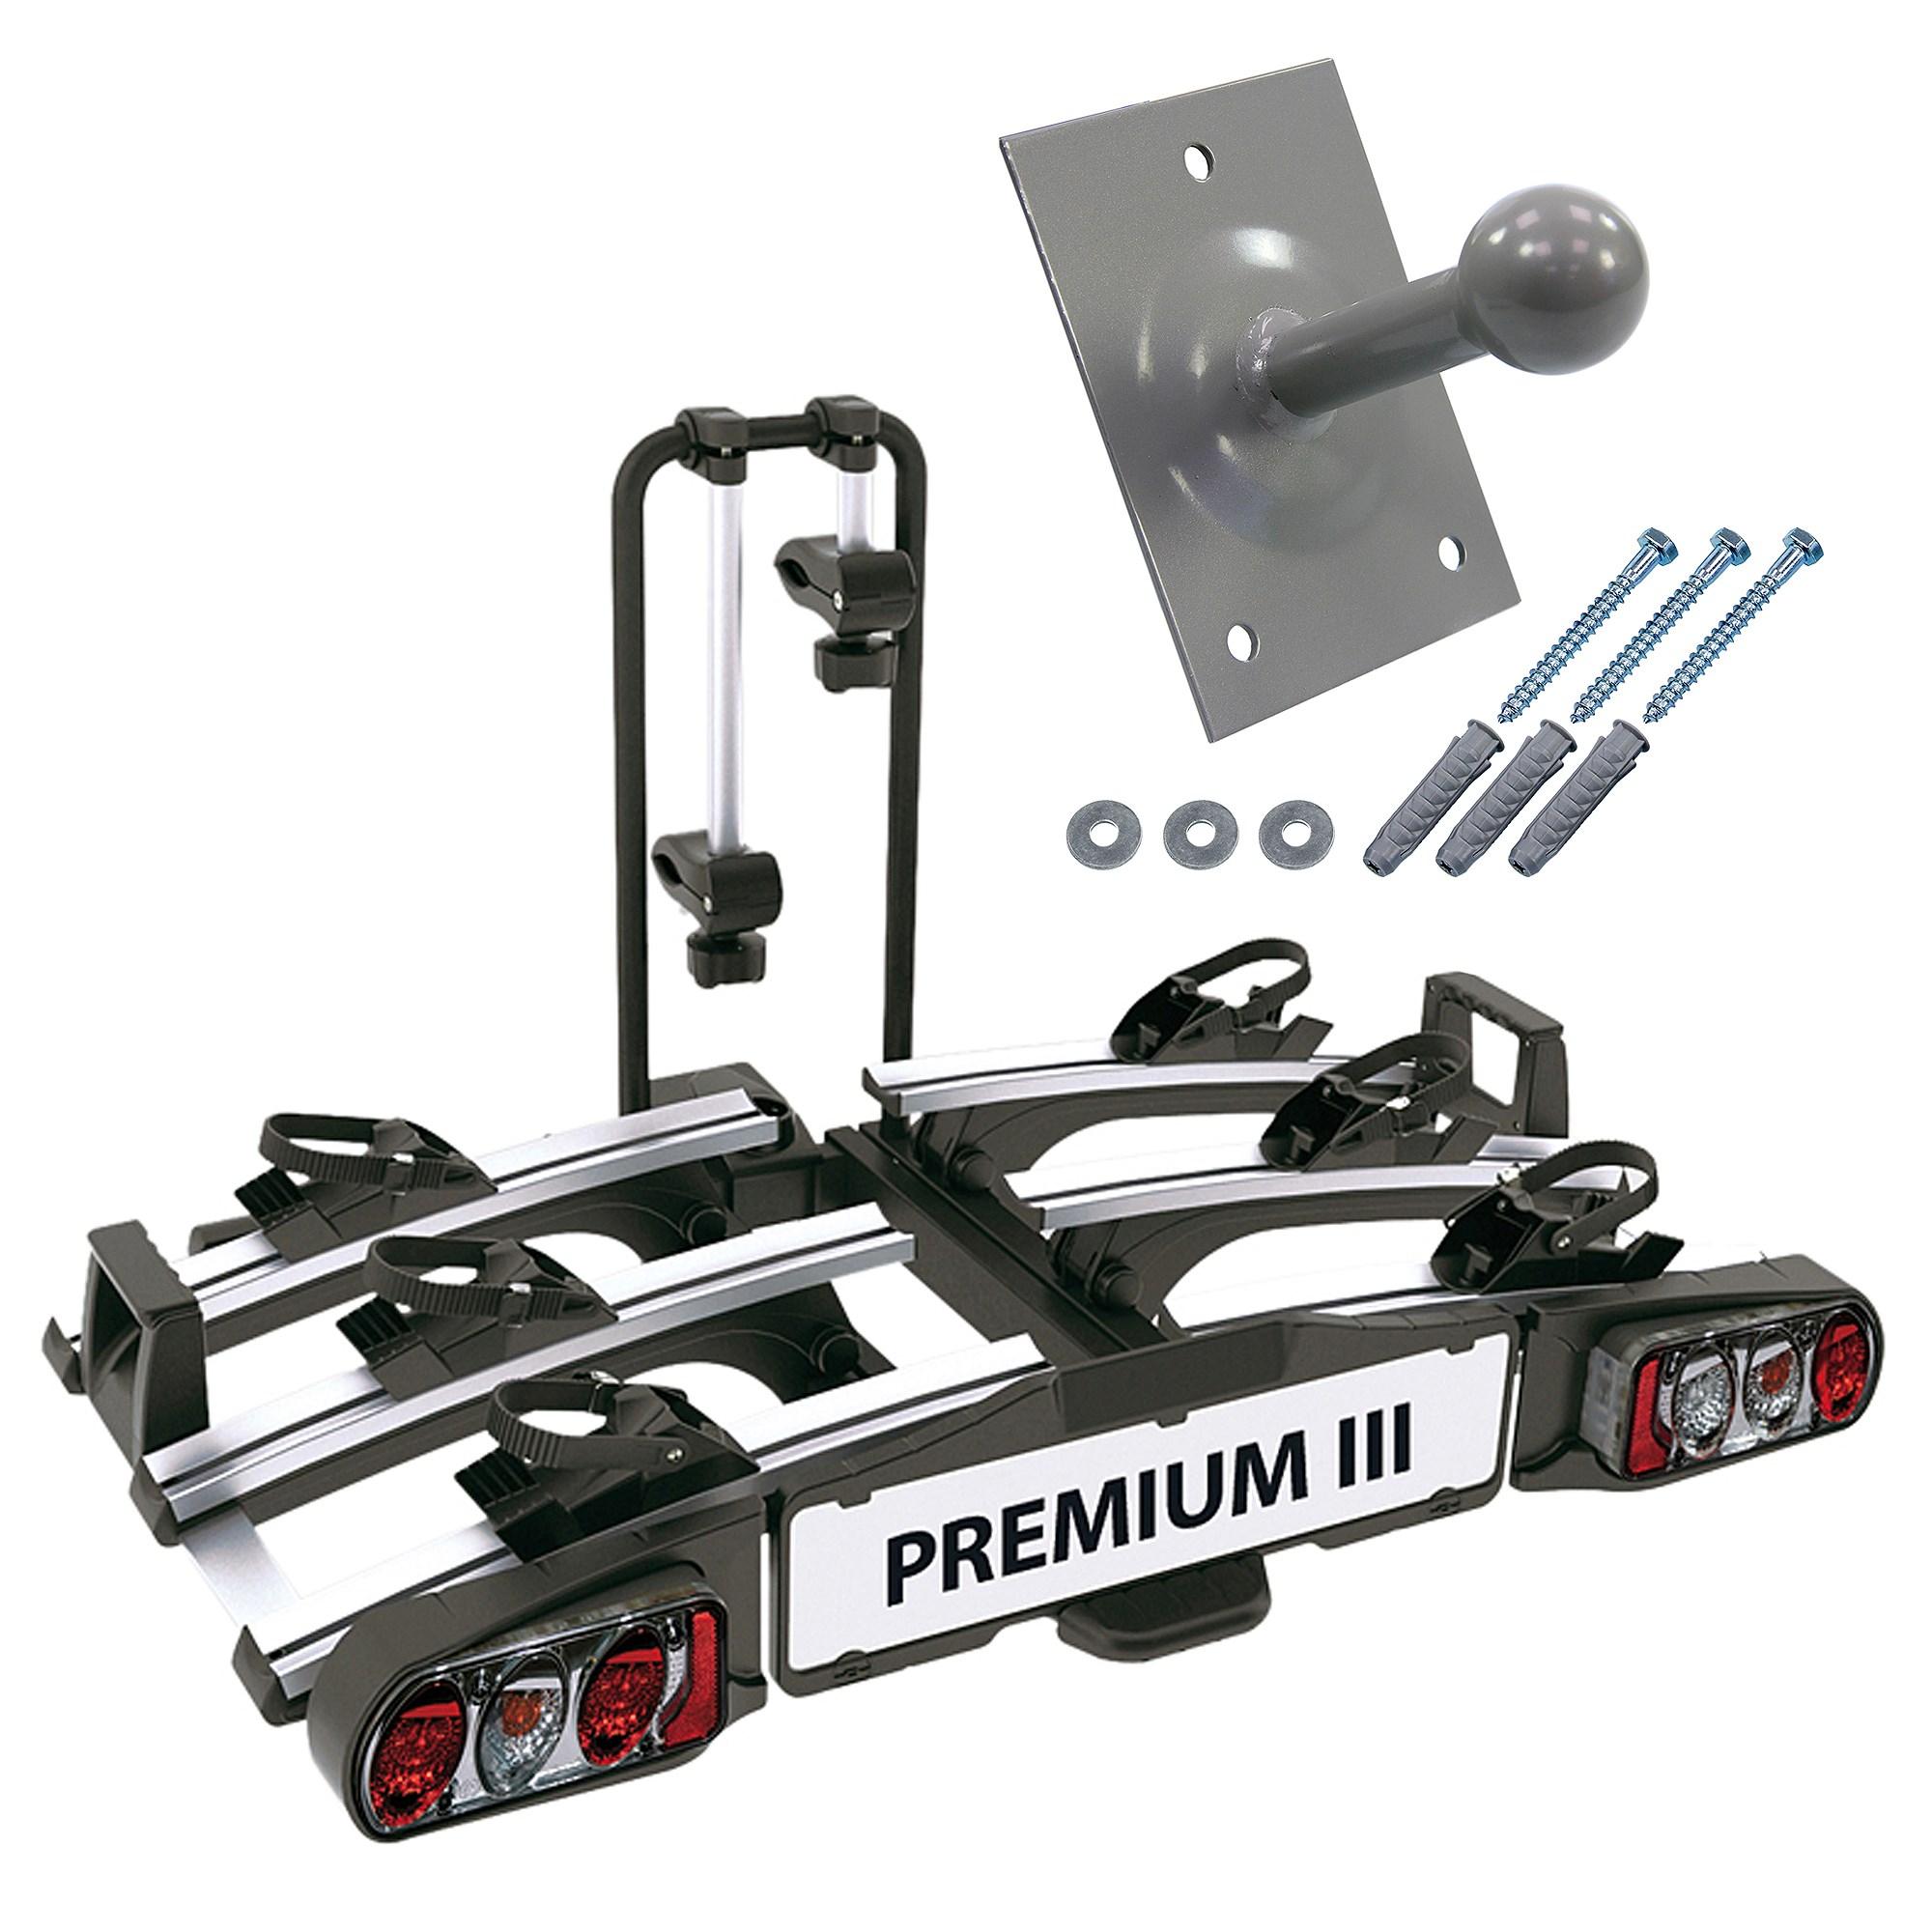 eufab premium fahrradtr ger iii ahk wandhalter atp autoteile. Black Bedroom Furniture Sets. Home Design Ideas